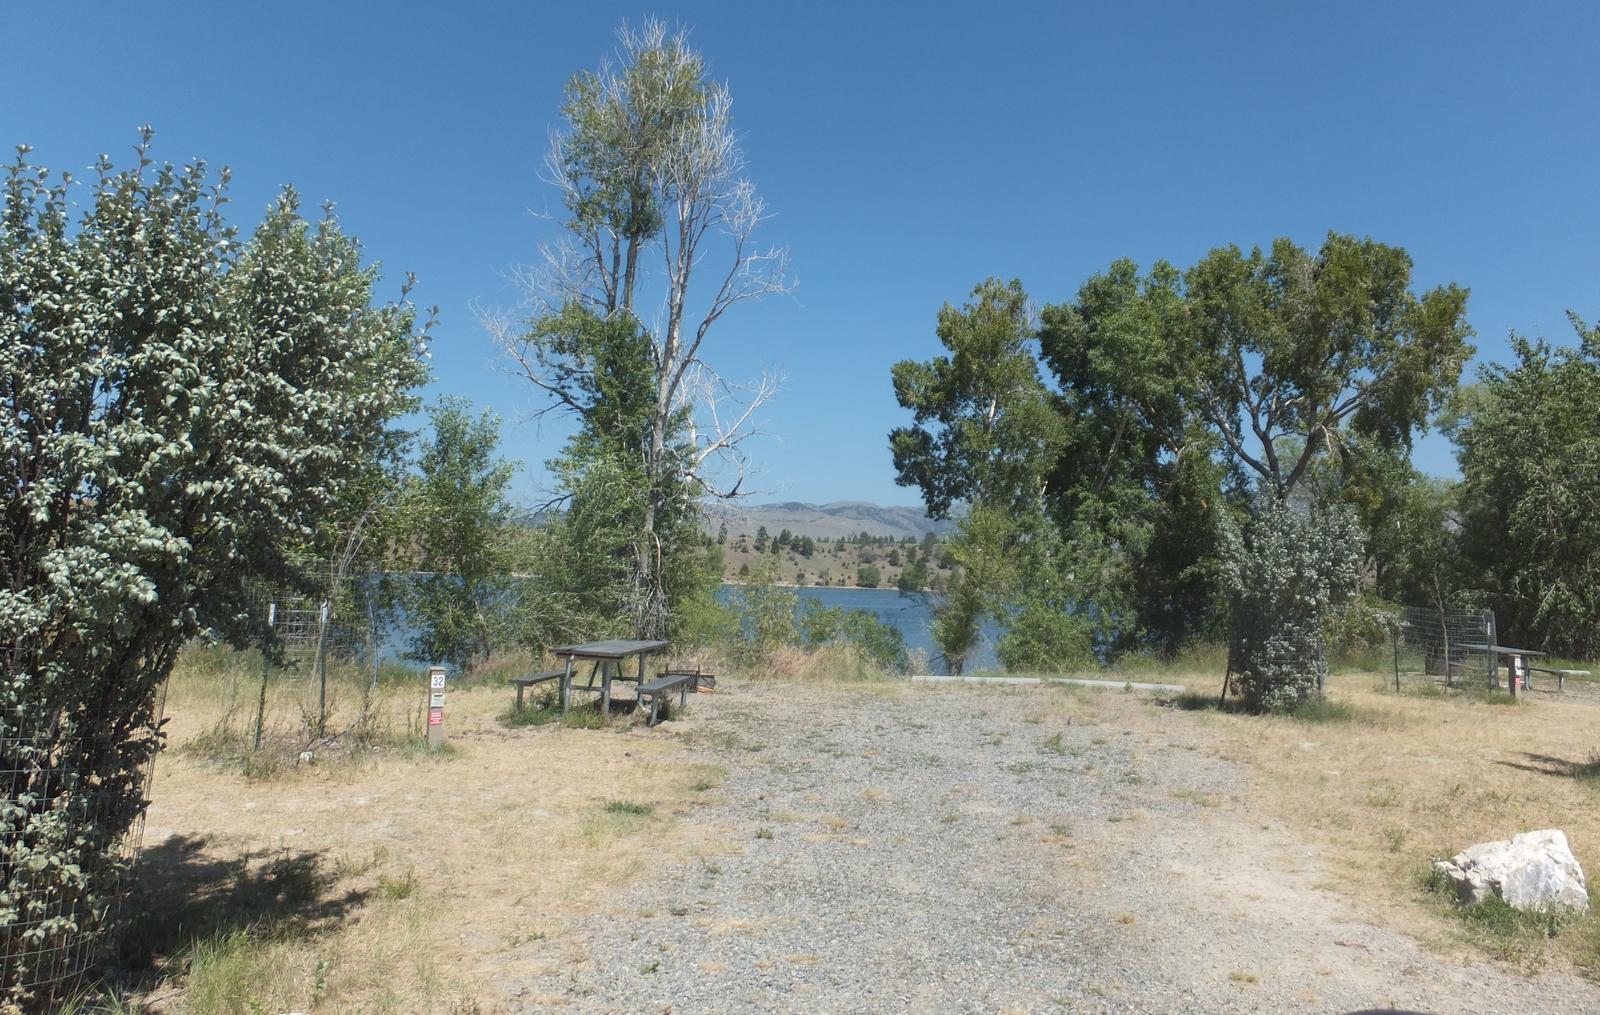 Hellgate Campground - Campsite 32